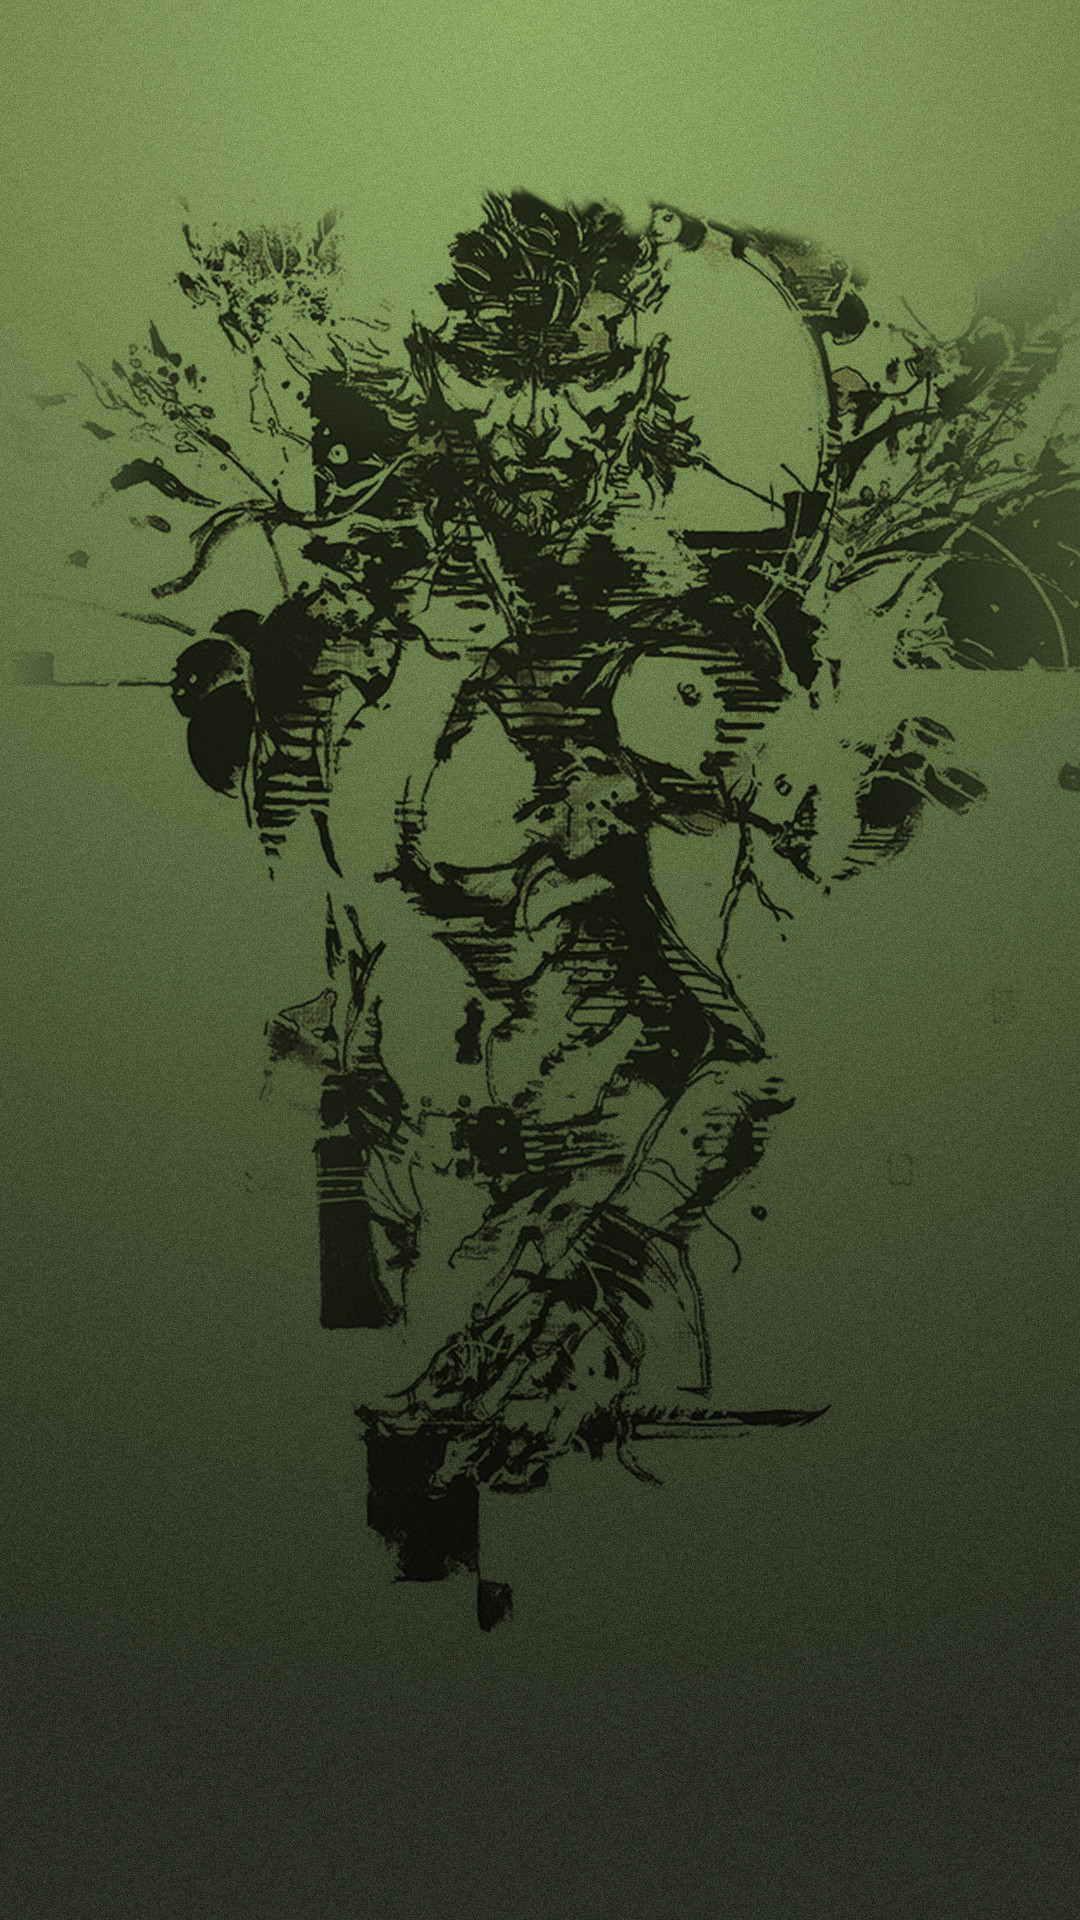 Metal Gear Solid Iphone Wallpaper 63 Images